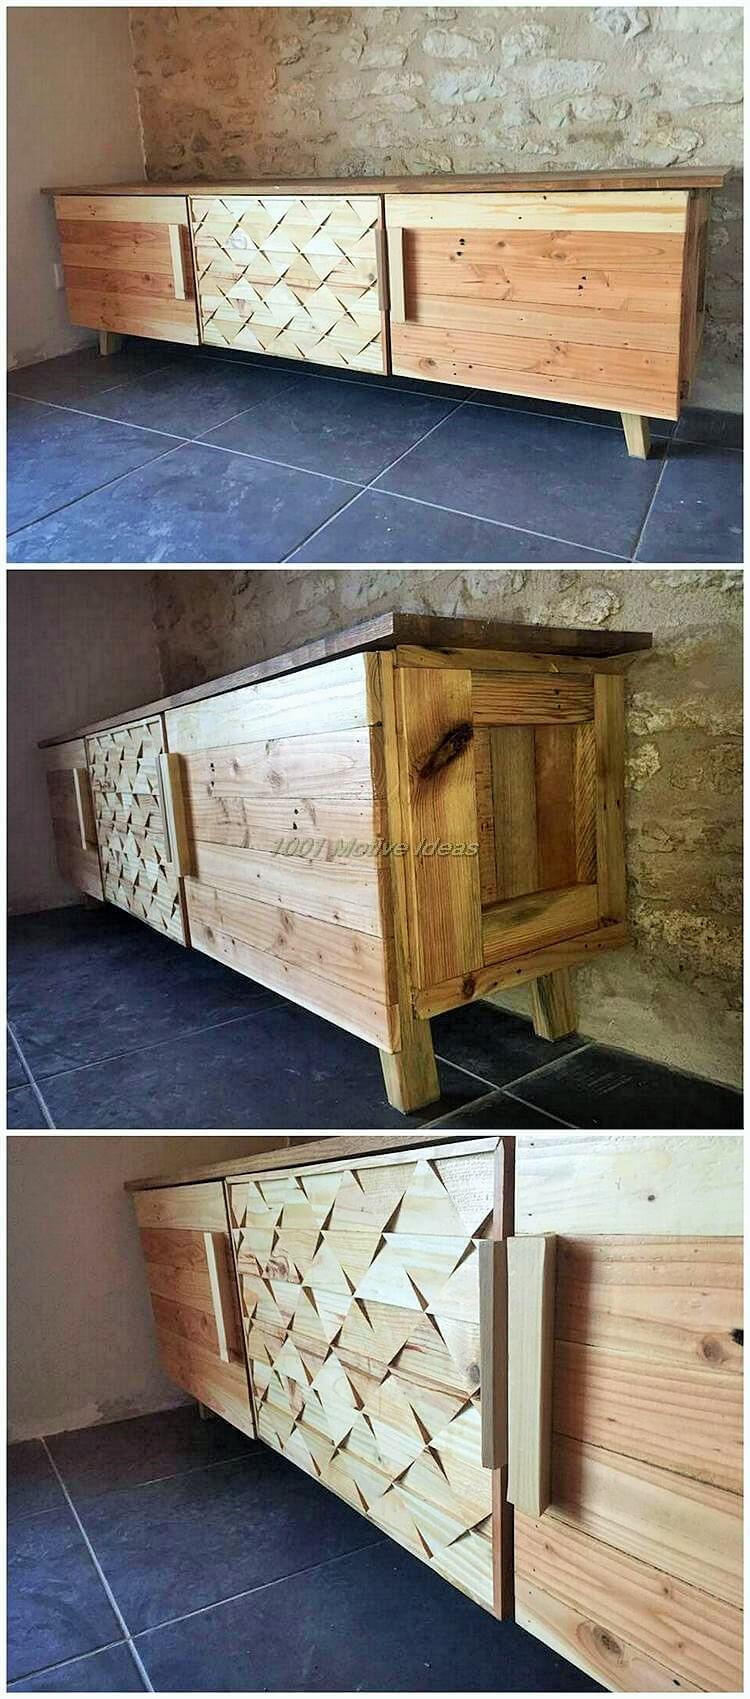 wooden-Pallet-Kitchen-furniture-Project-Ideas-007